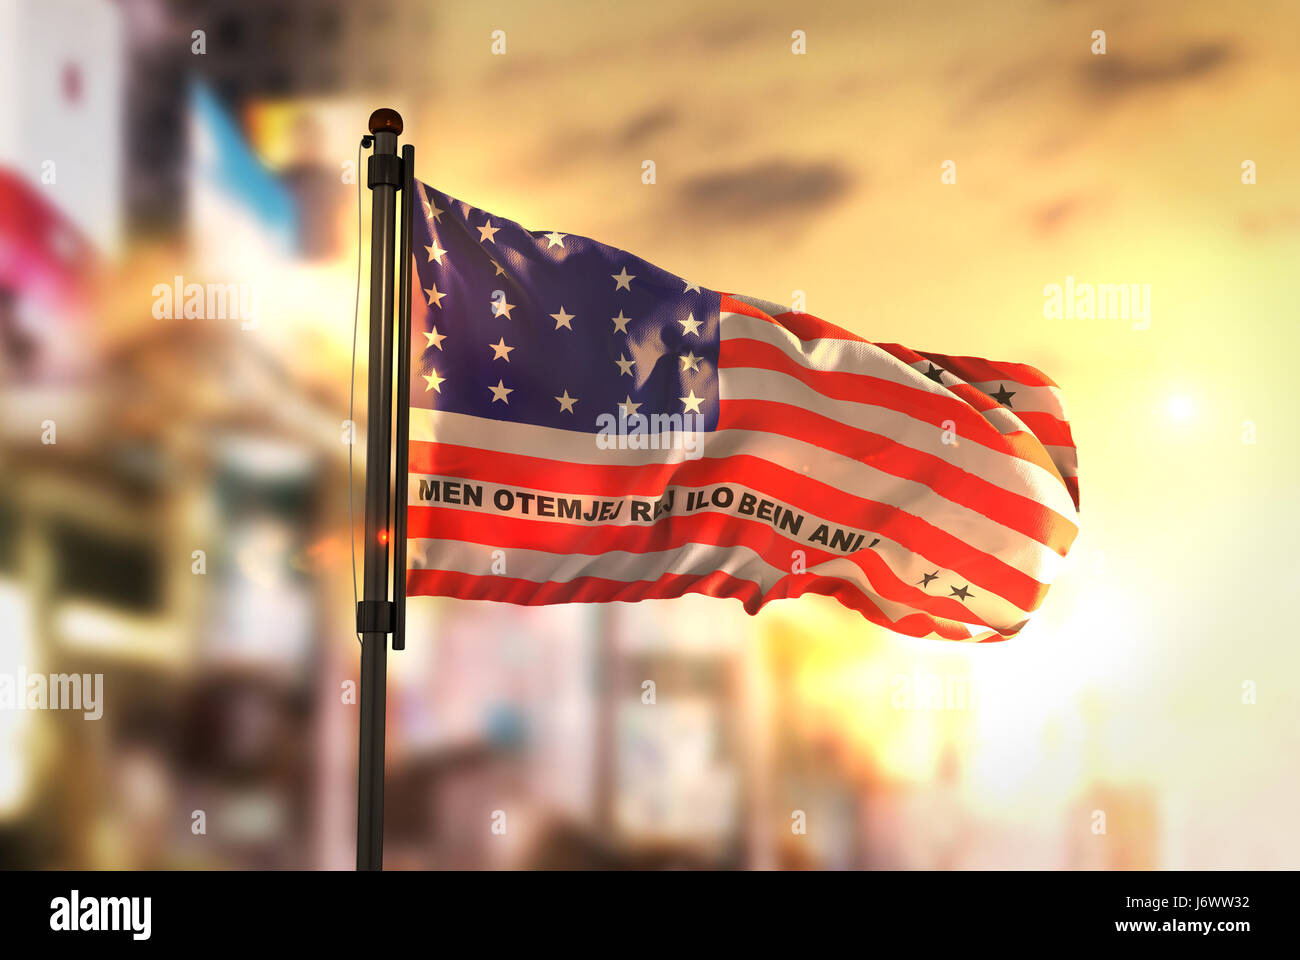 Bikini Atoll Flag Against City Blurred Background At Sunrise Backlight - Stock Image